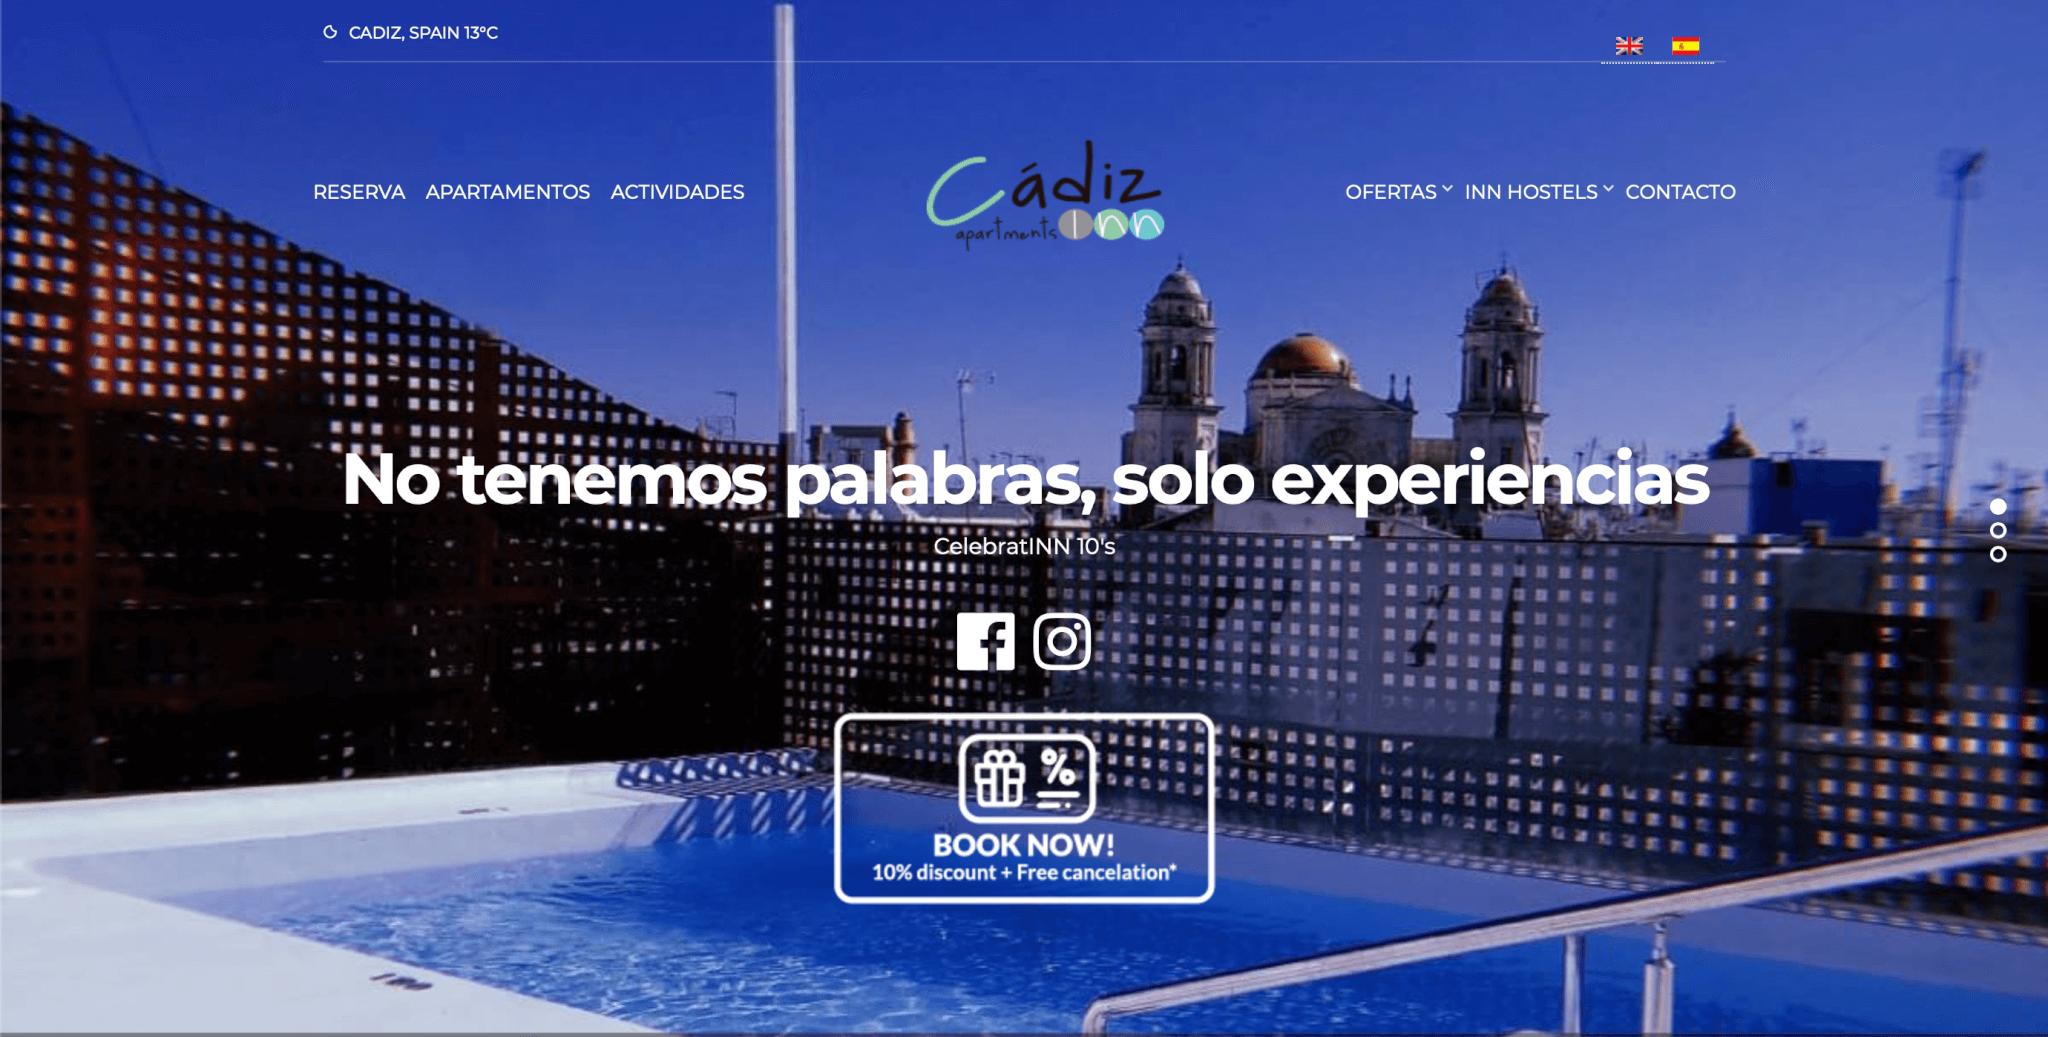 web hoteles cadiz